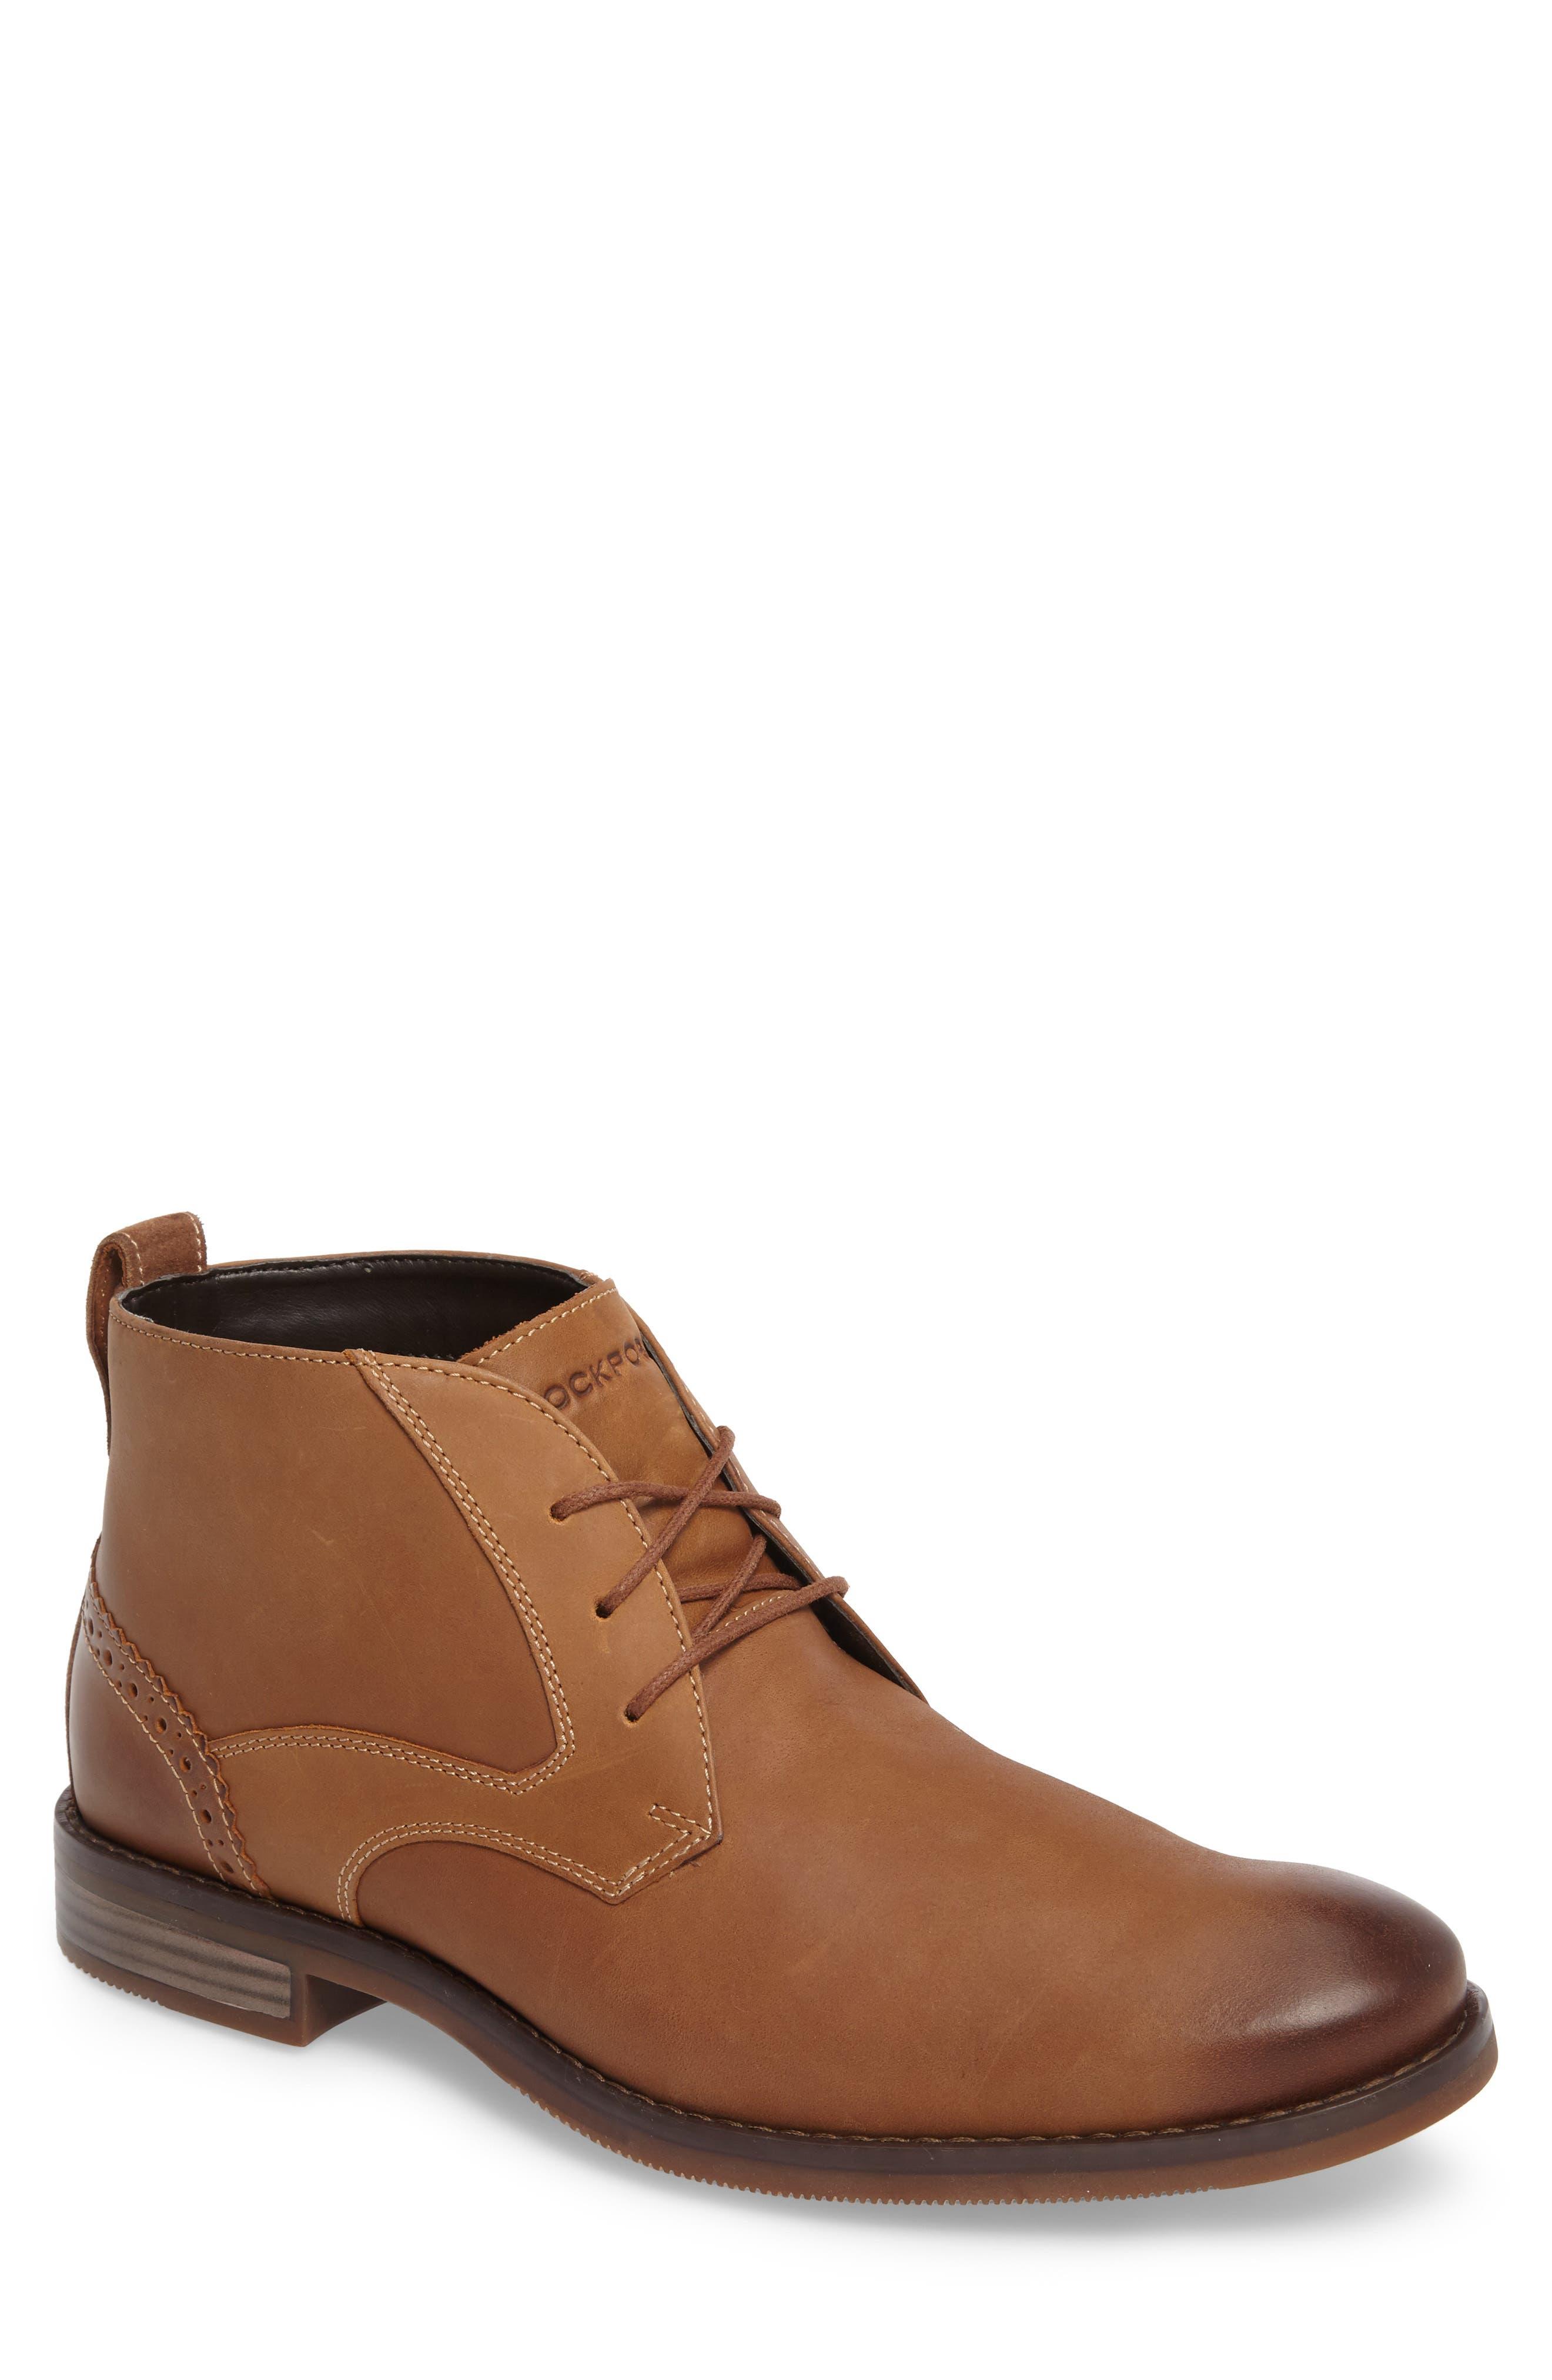 Wynstin Chukka Boot,                             Main thumbnail 1, color,                             Tobacco Leather